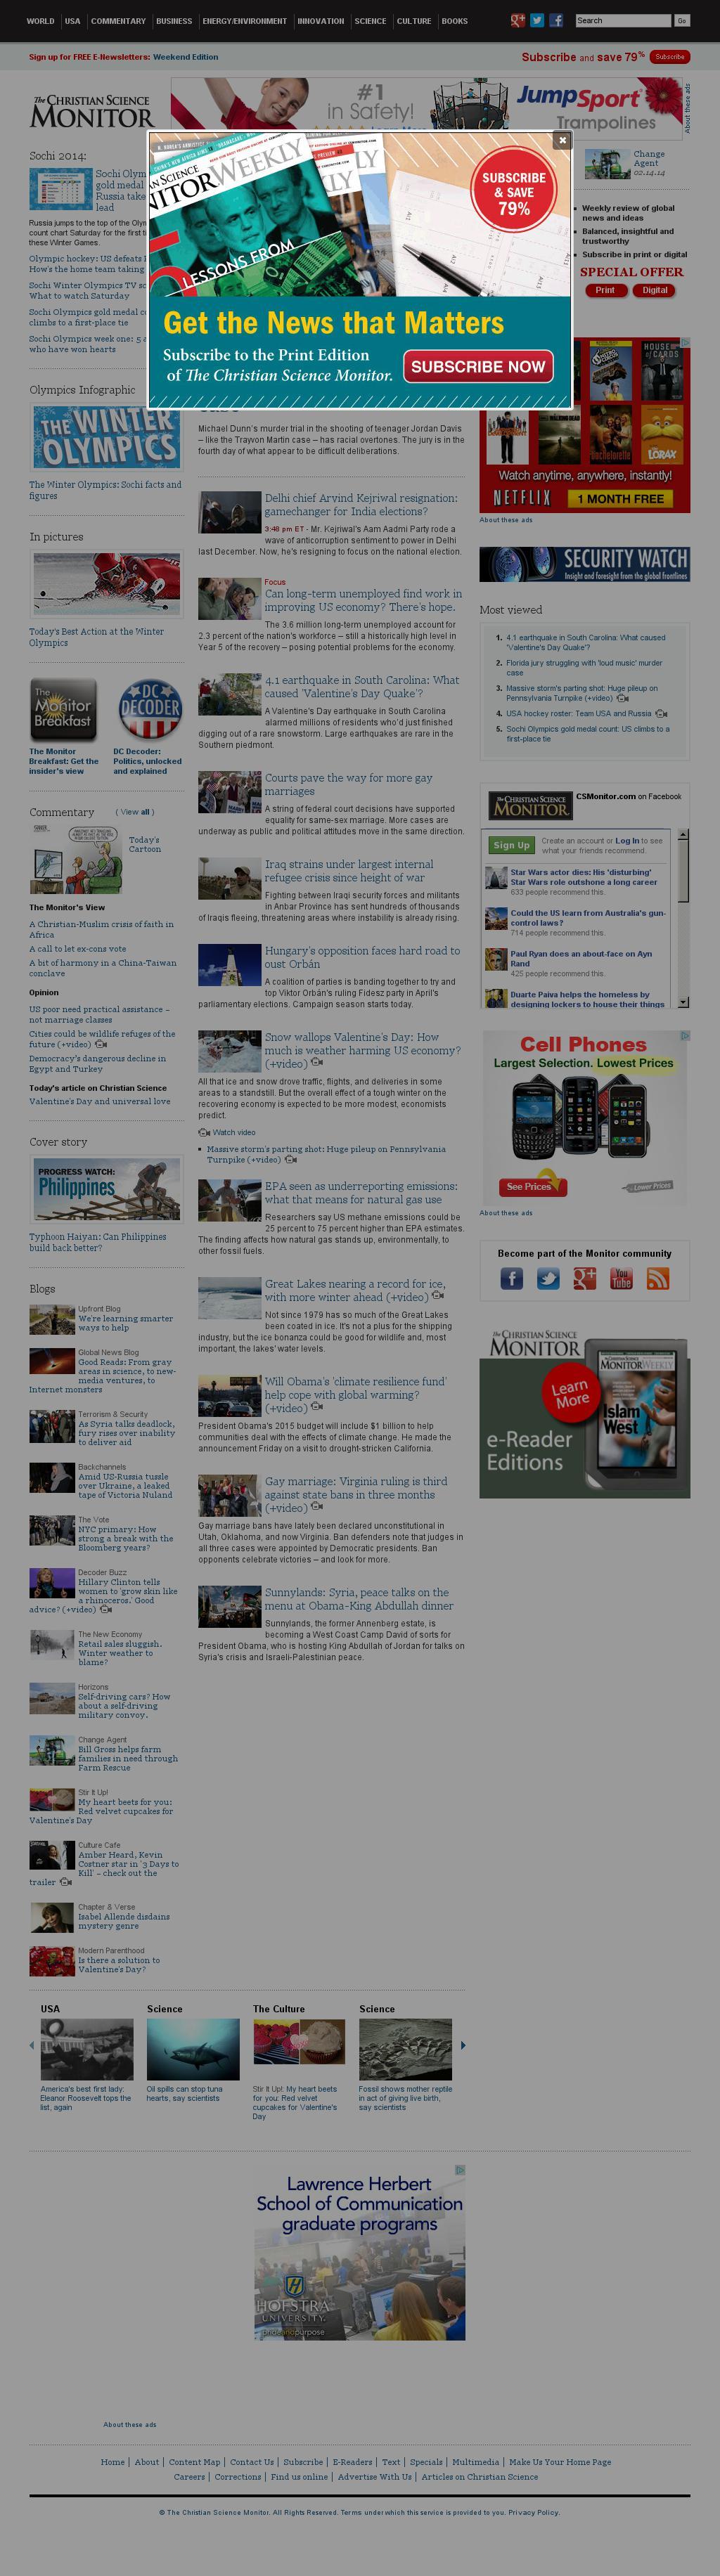 The Christian Science Monitor at Saturday Feb. 15, 2014, 11:02 p.m. UTC